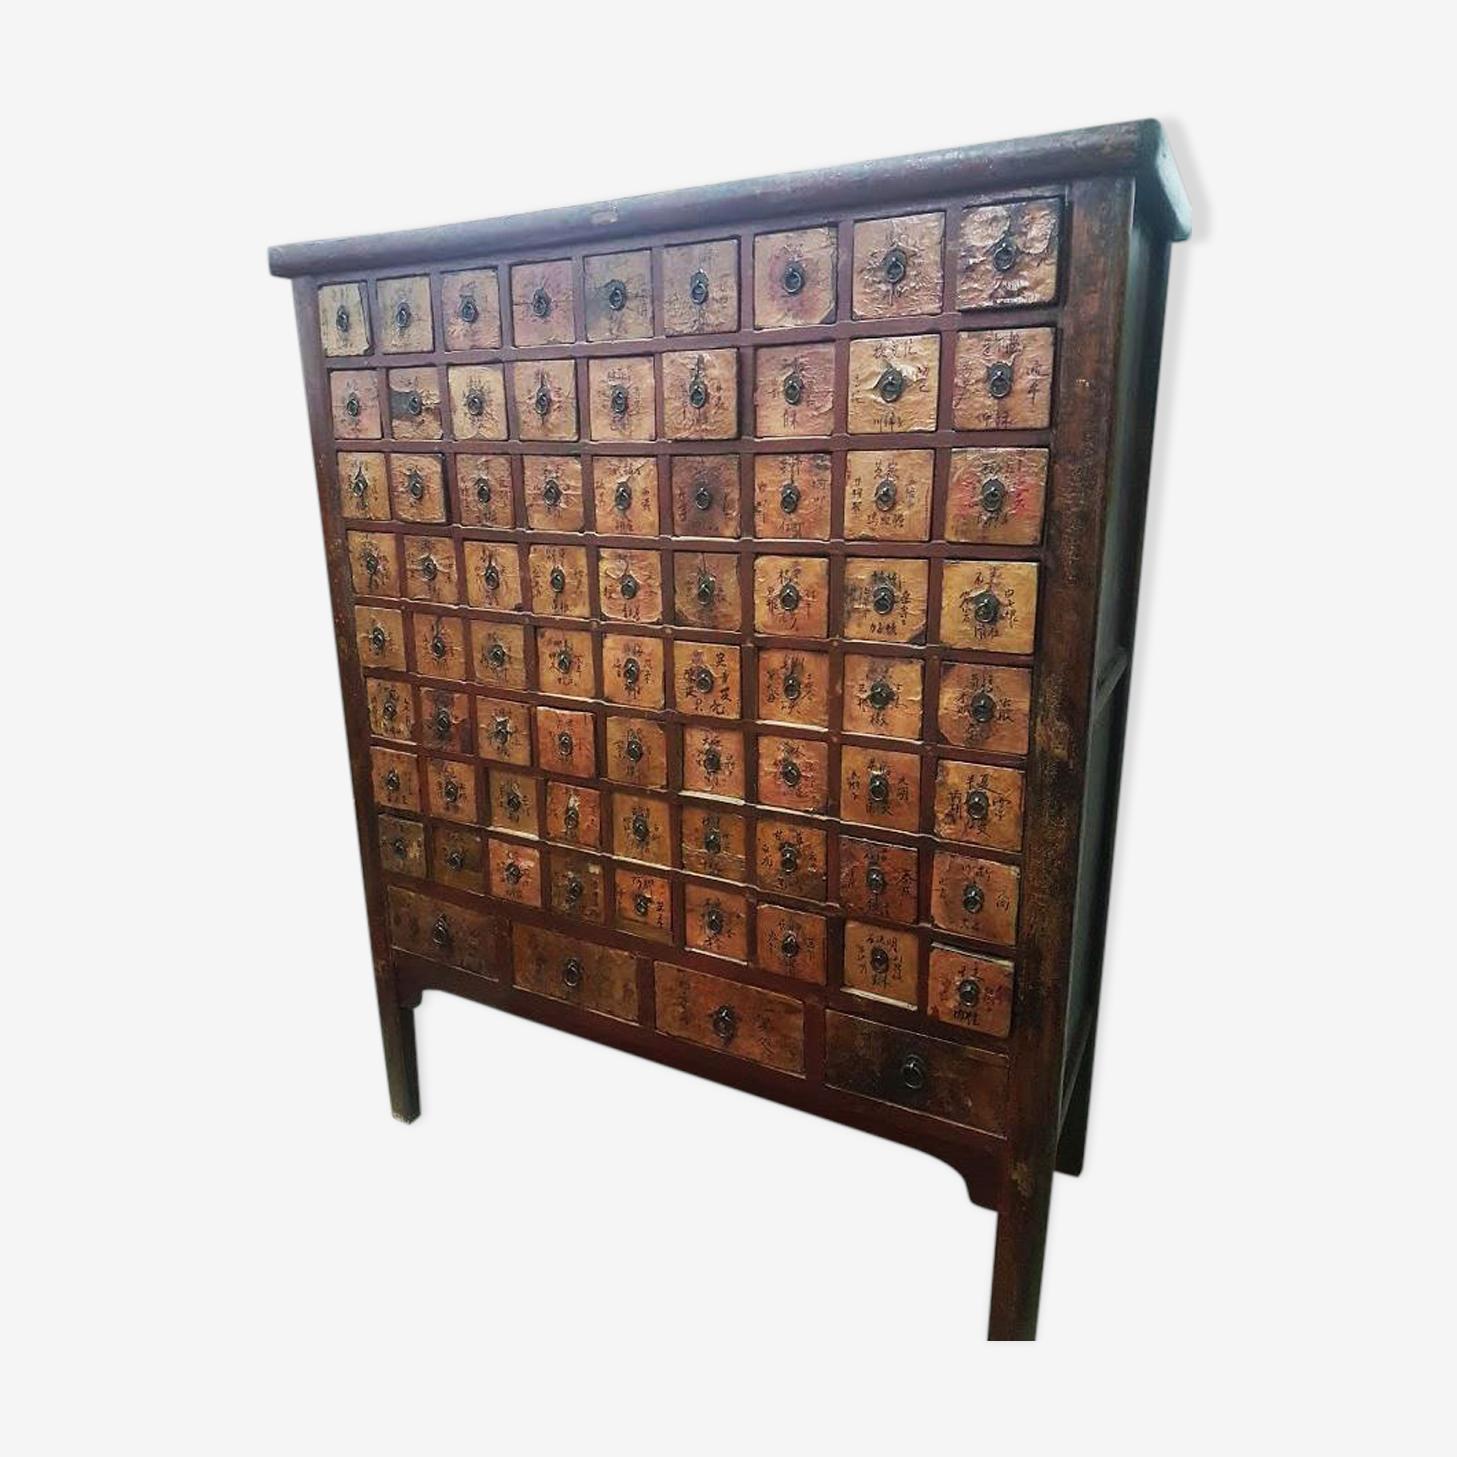 Ancien meuble chinois d'apothicaire 76 tiroirs